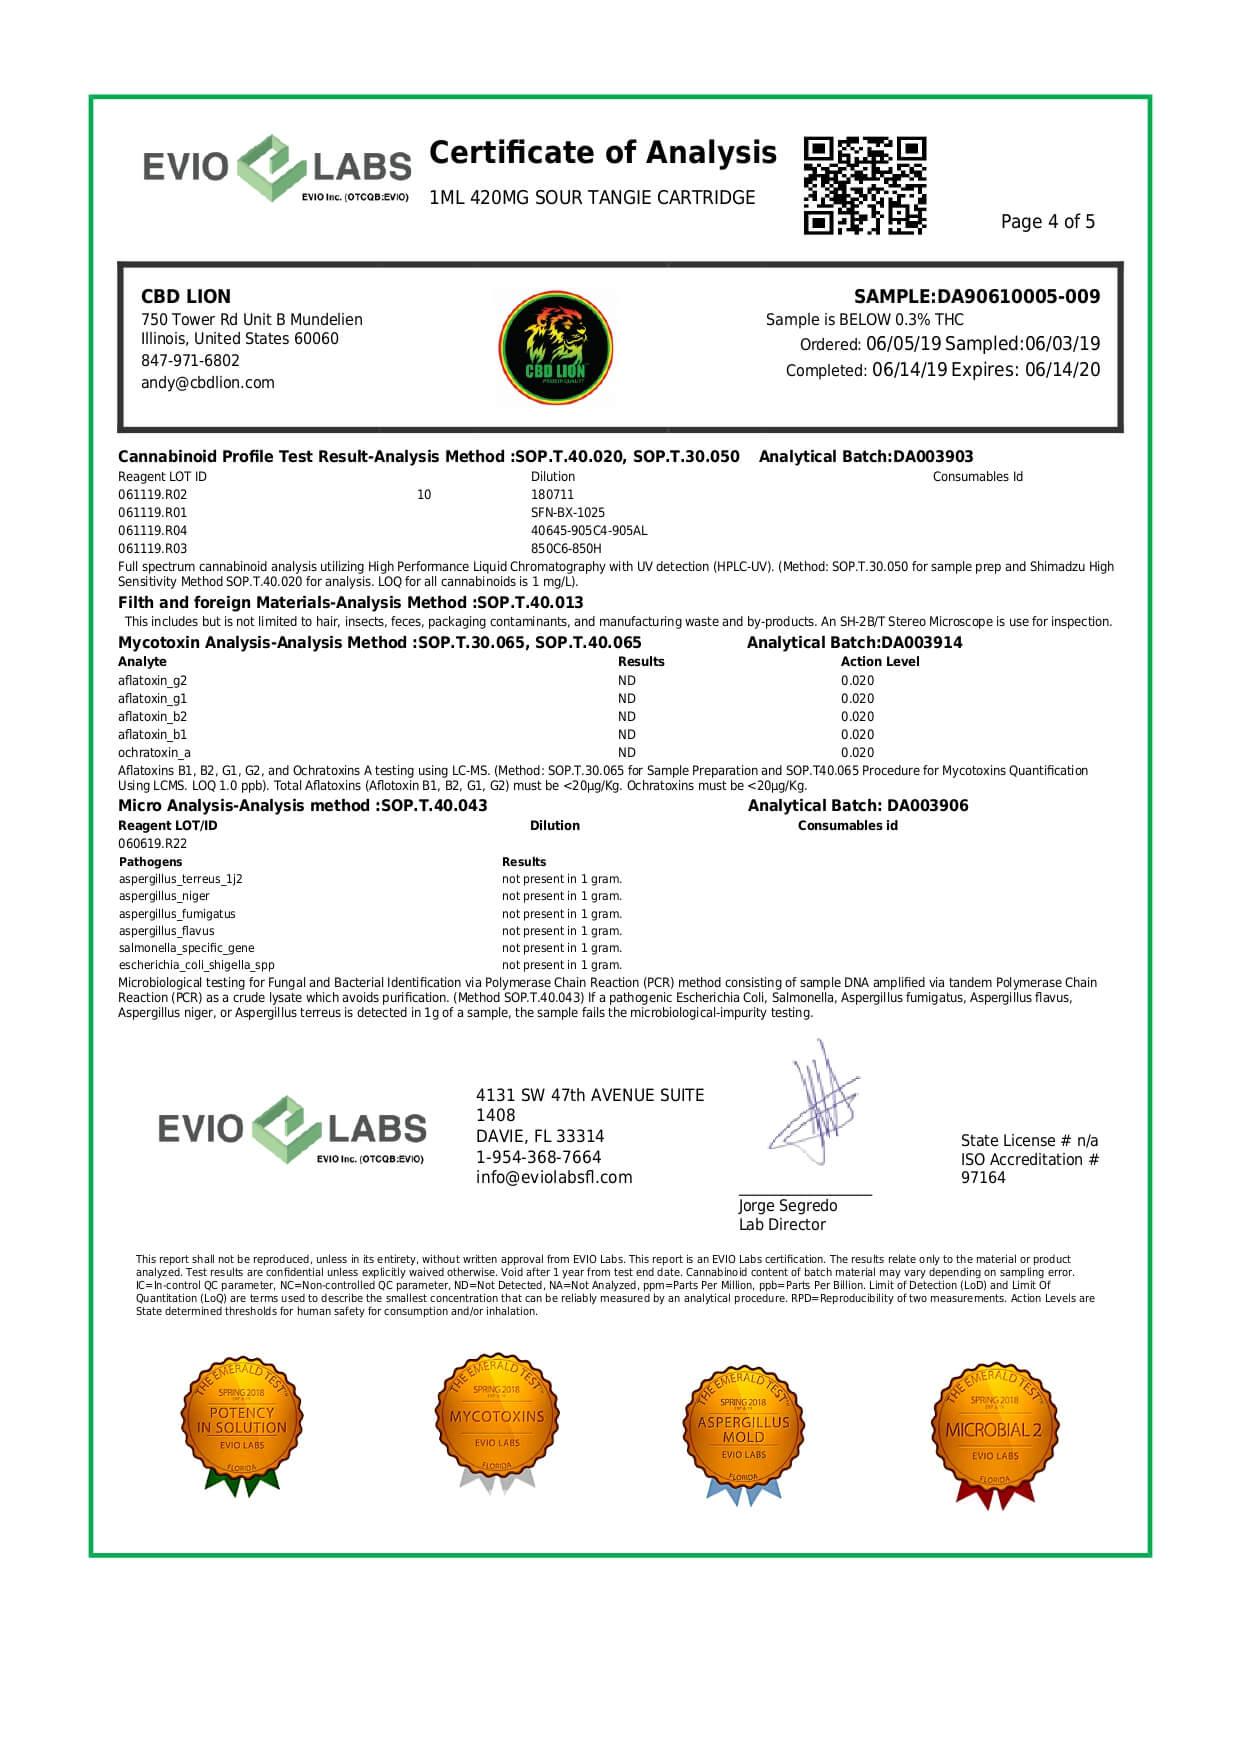 CBD Lion CBD Cartridge Sour Tangie 420mg Lab Report